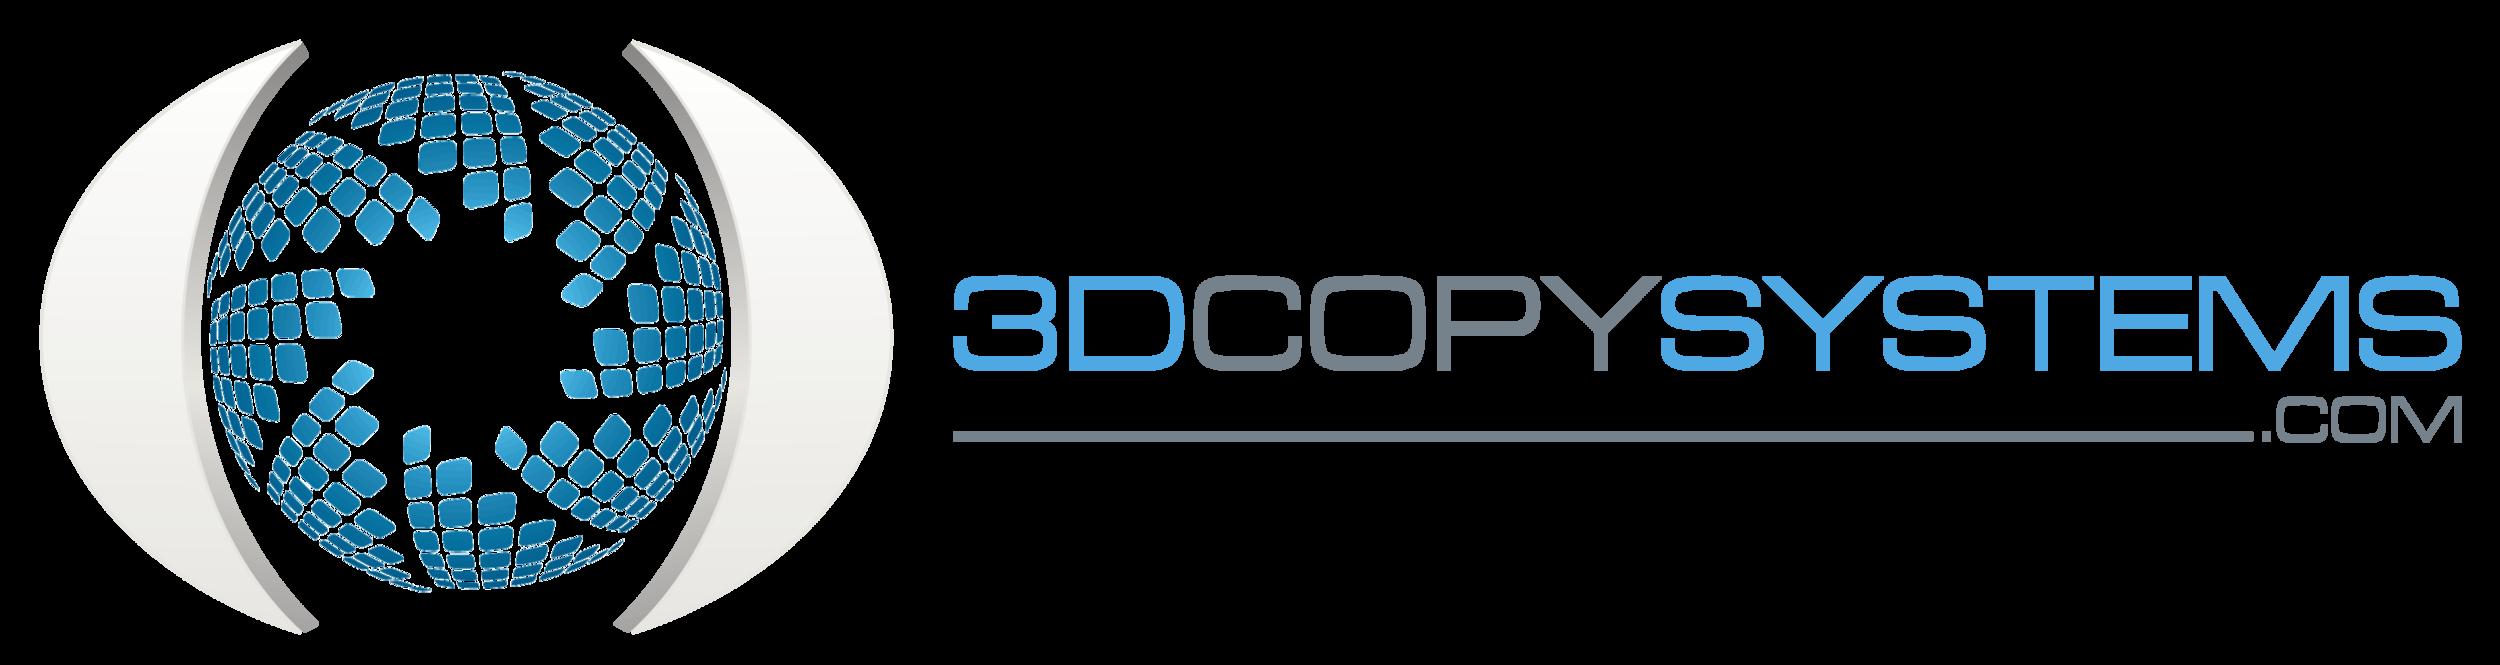 3Dcopysystems_logo-1.png